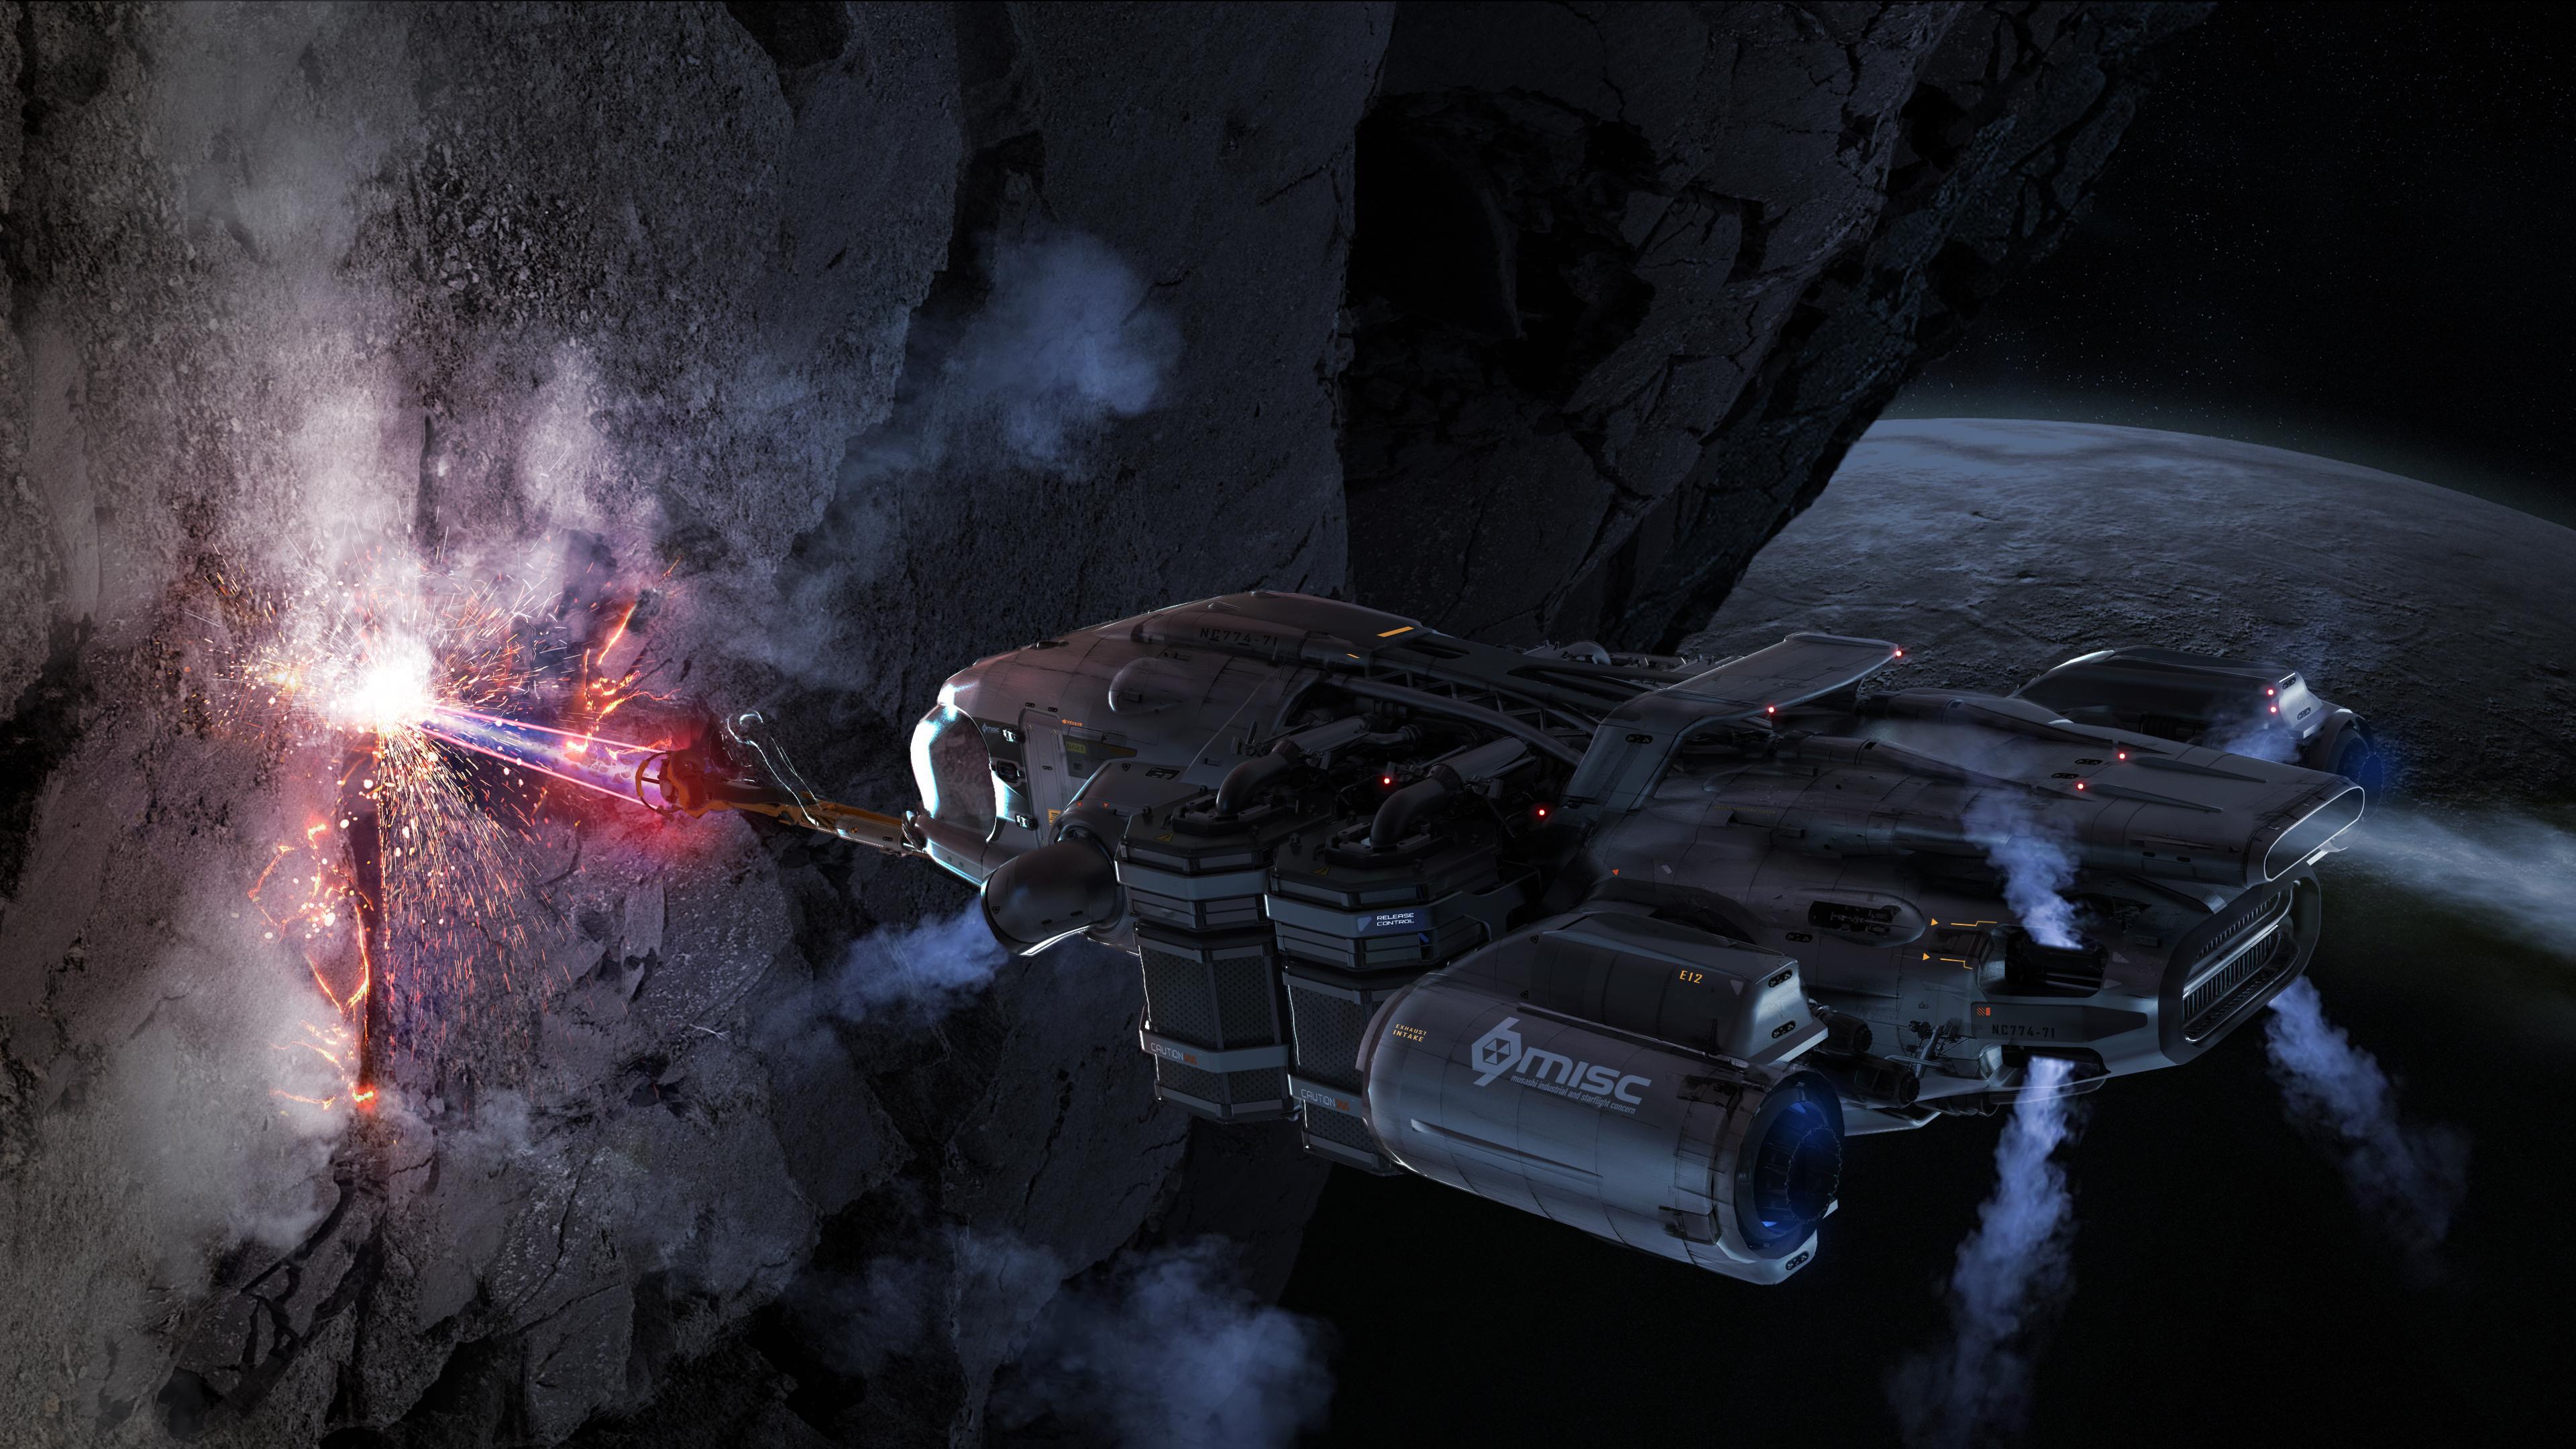 MISC-Mining-Vehicle-PIECE-4-V21